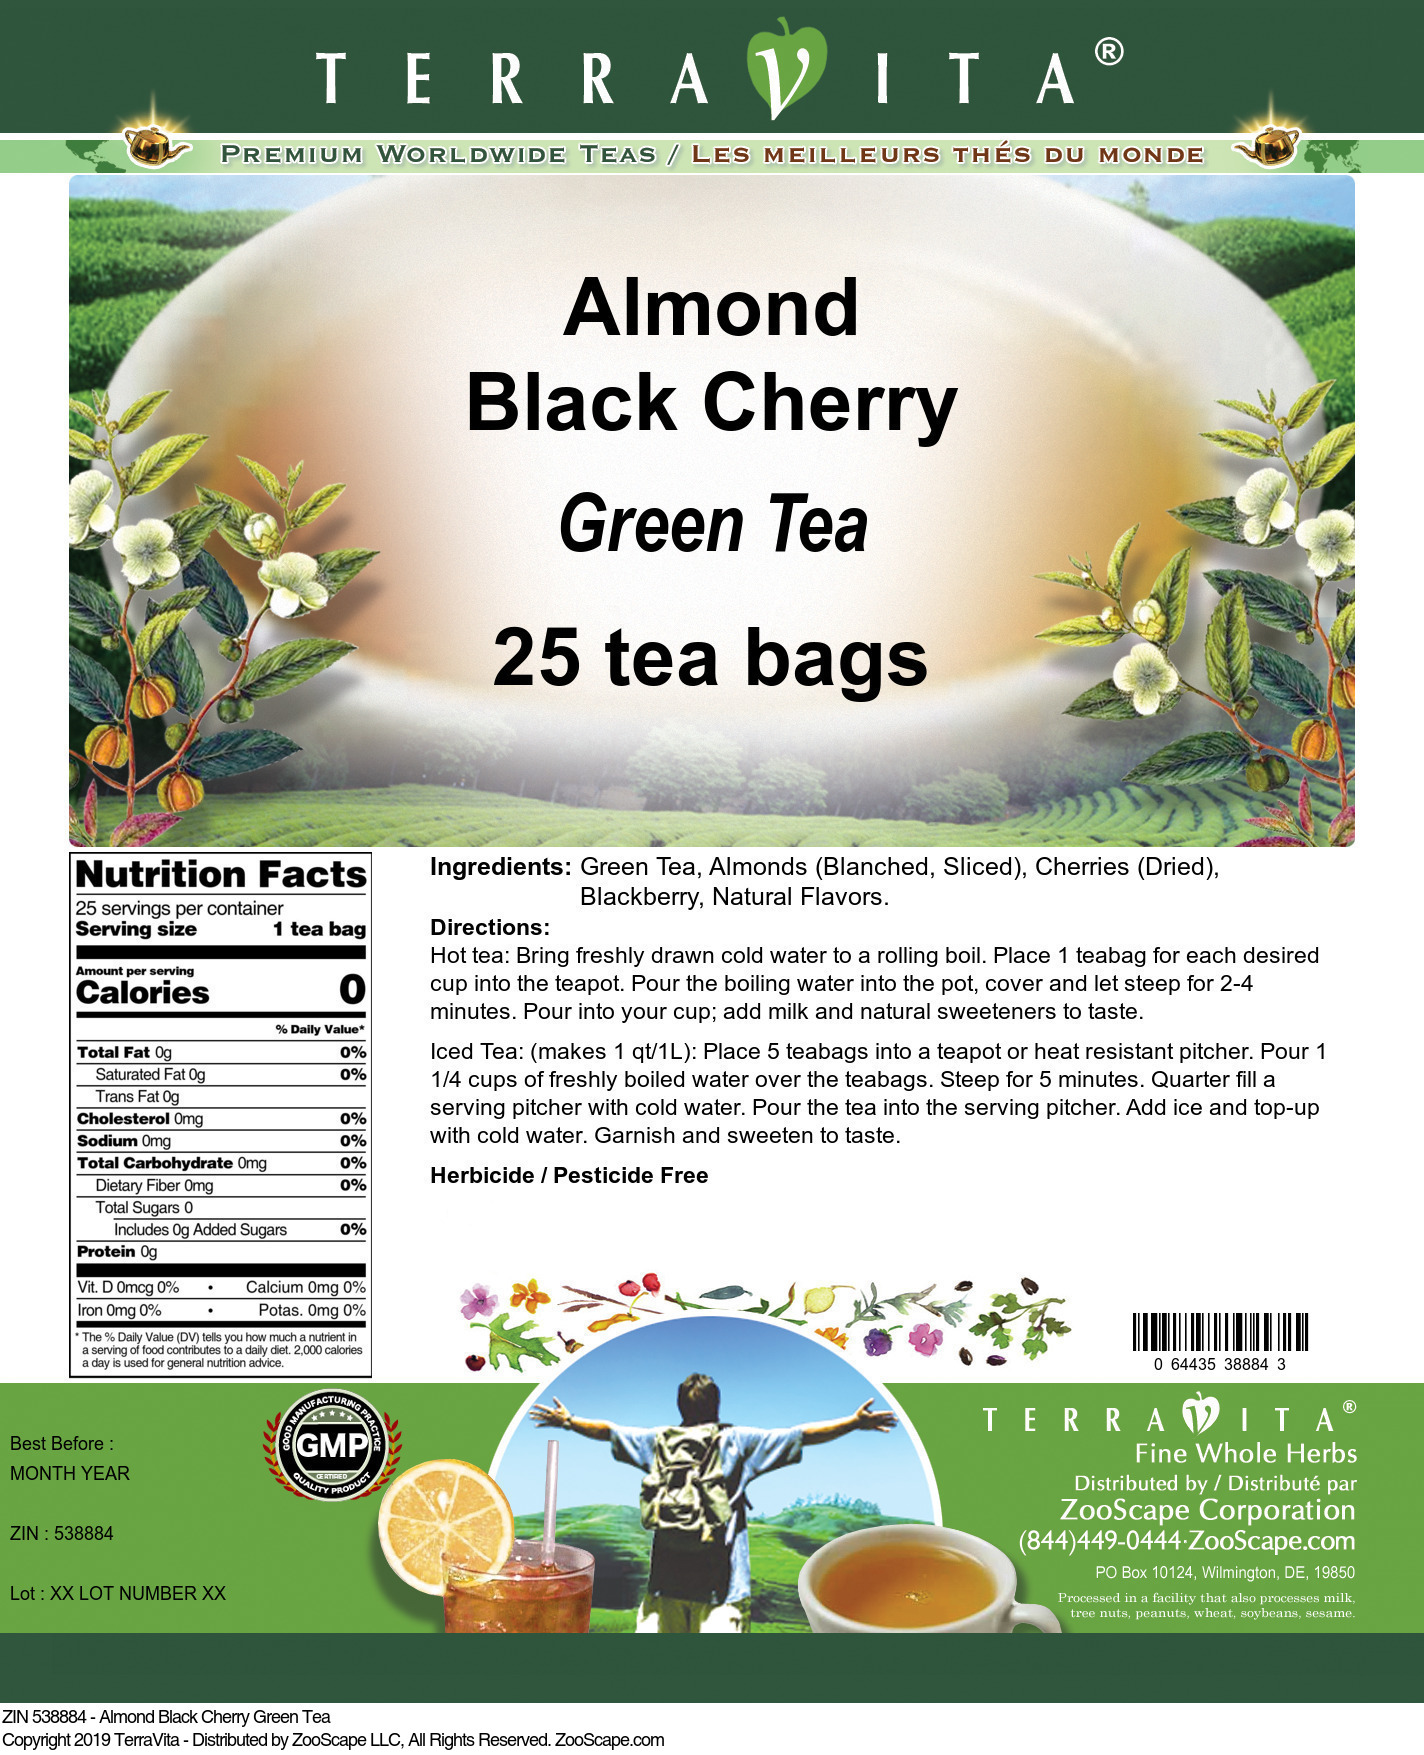 Almond Black Cherry Green Tea